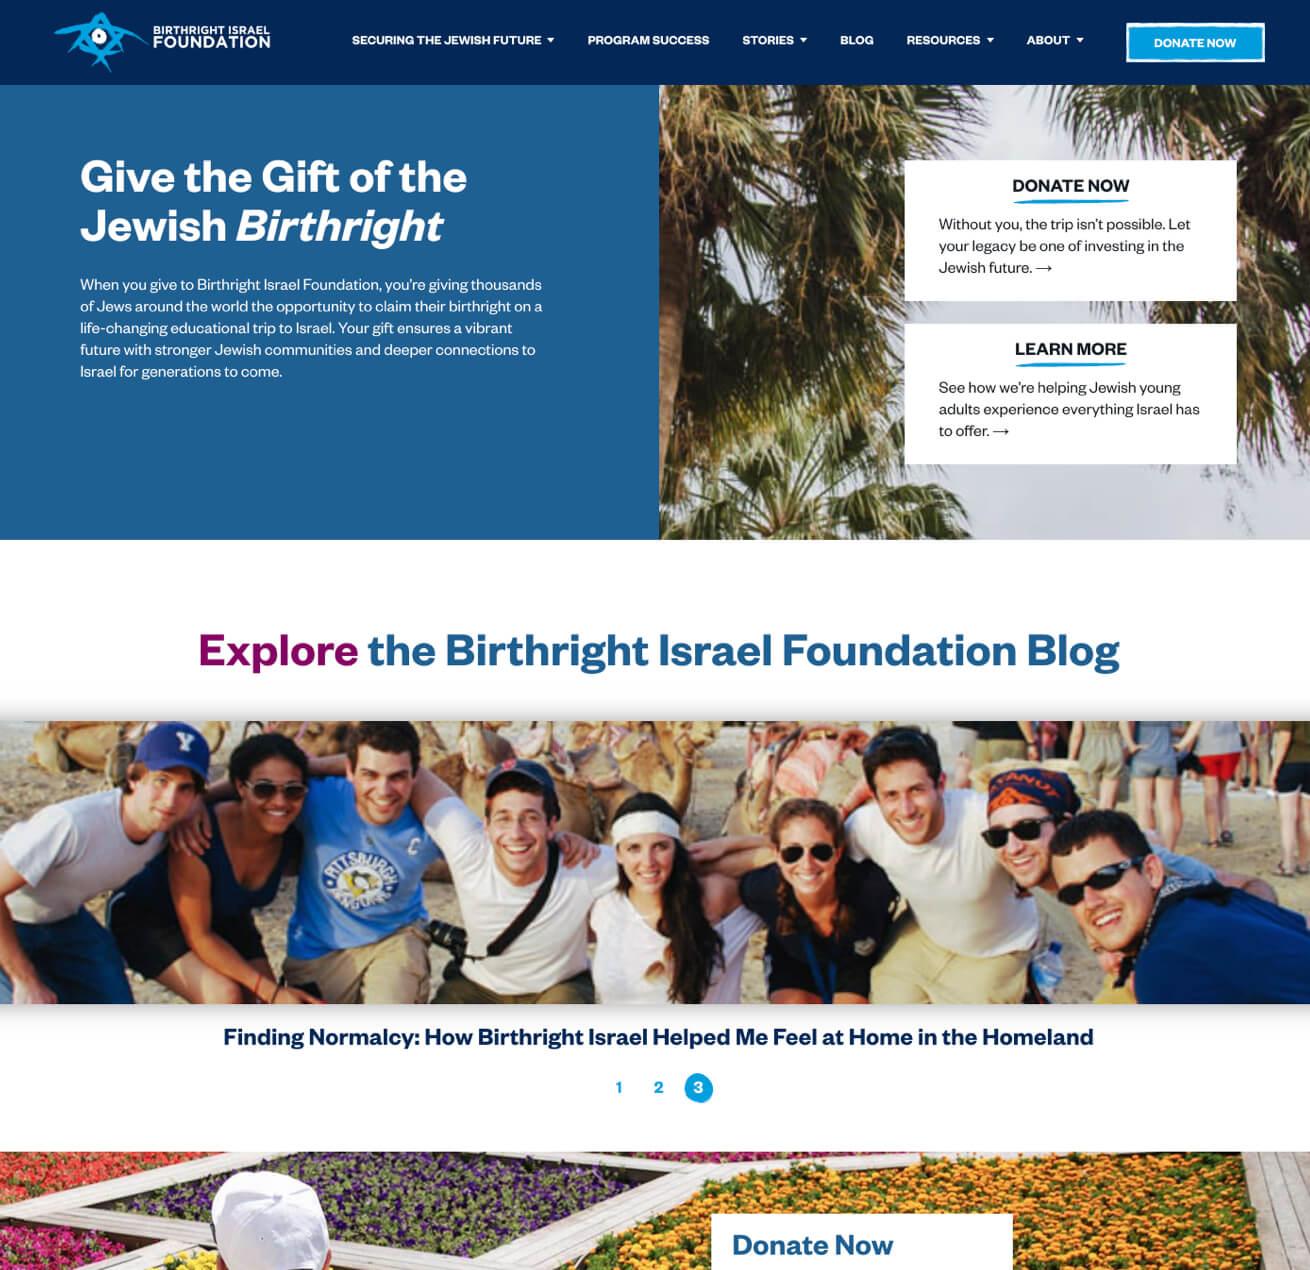 Birthright Israel Foundation Cause Highlighted on Website